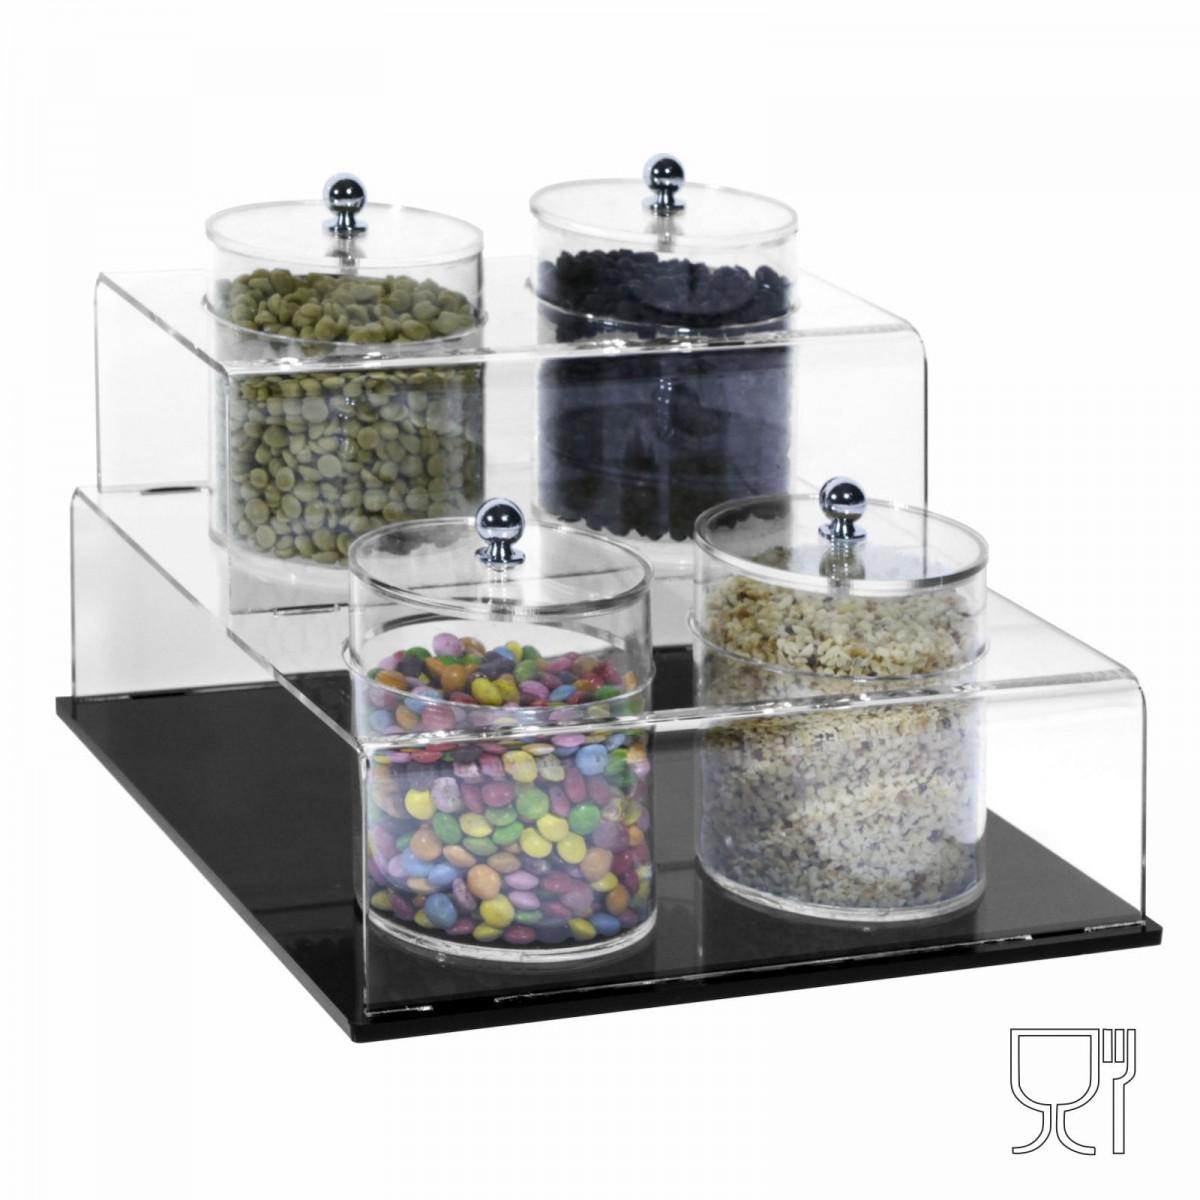 Contenedor para topping o granilla en plexiglás transparente y base negra